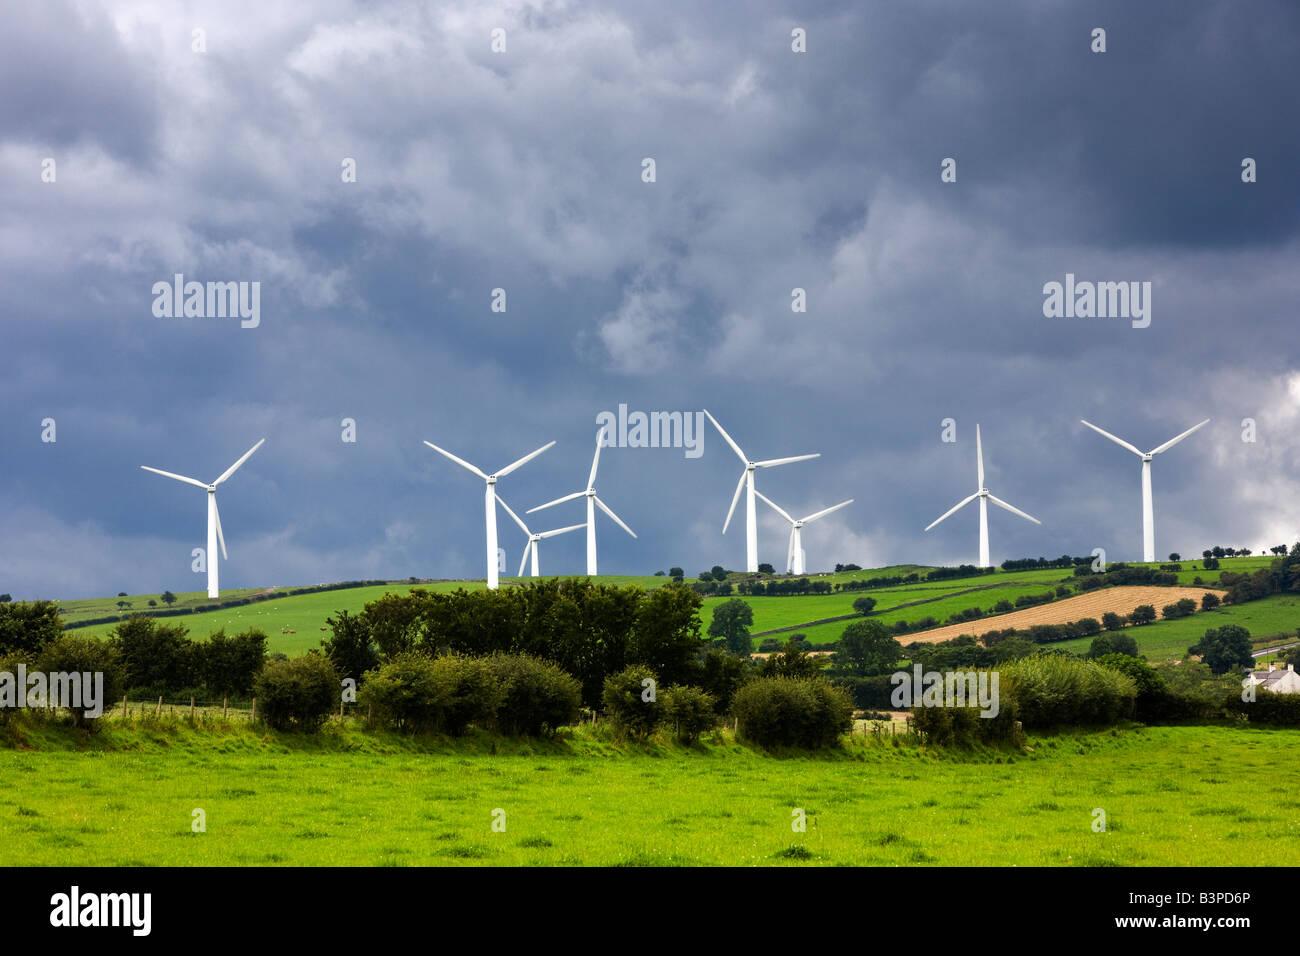 Turbine-Windpark bei Bothel, Lake District, Cumbria, UK Stockbild